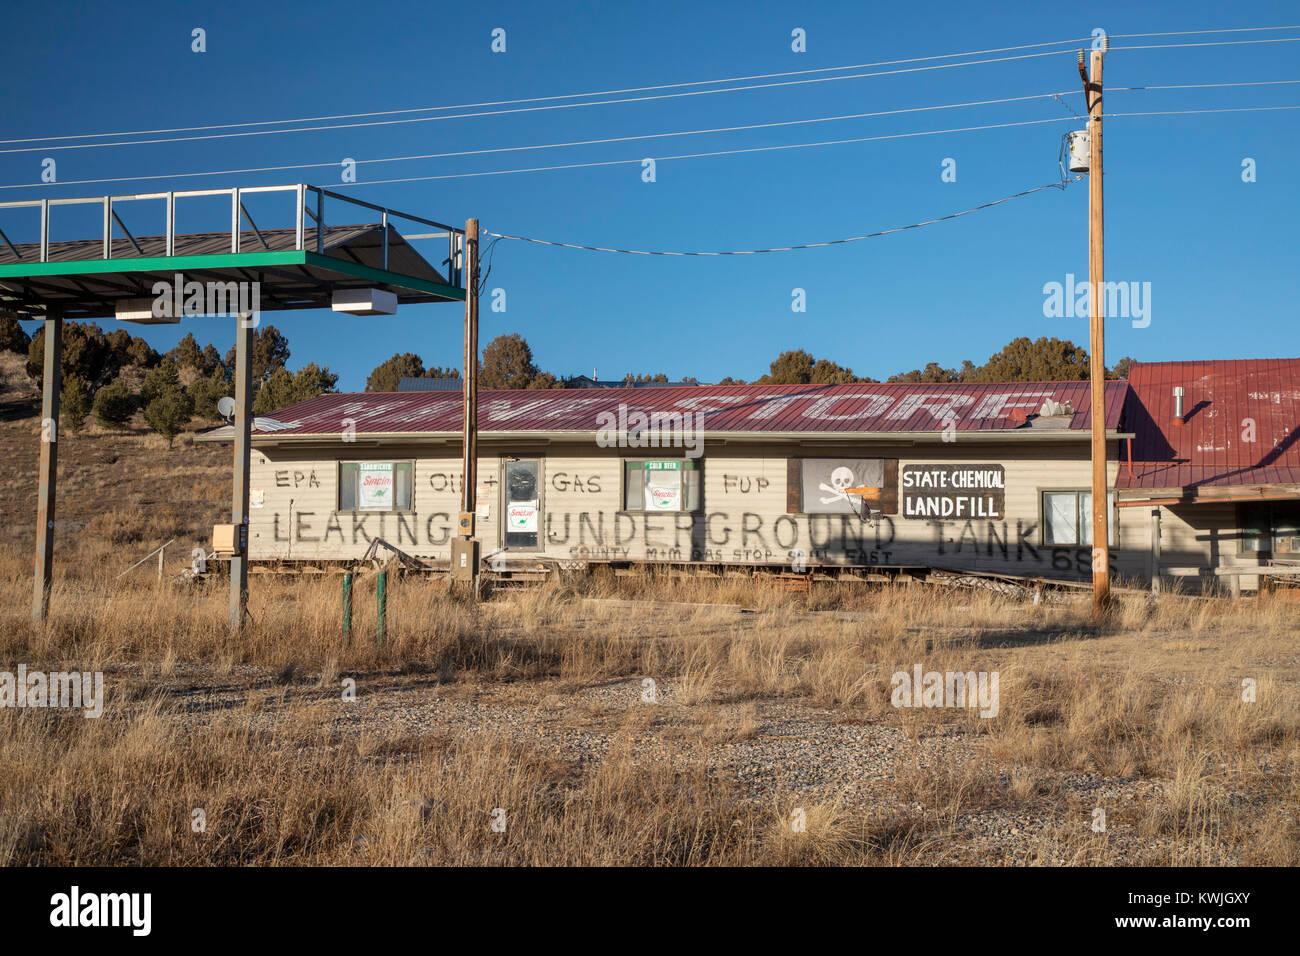 Closed Petrol Station Stock Photos Amp Closed Petrol Station